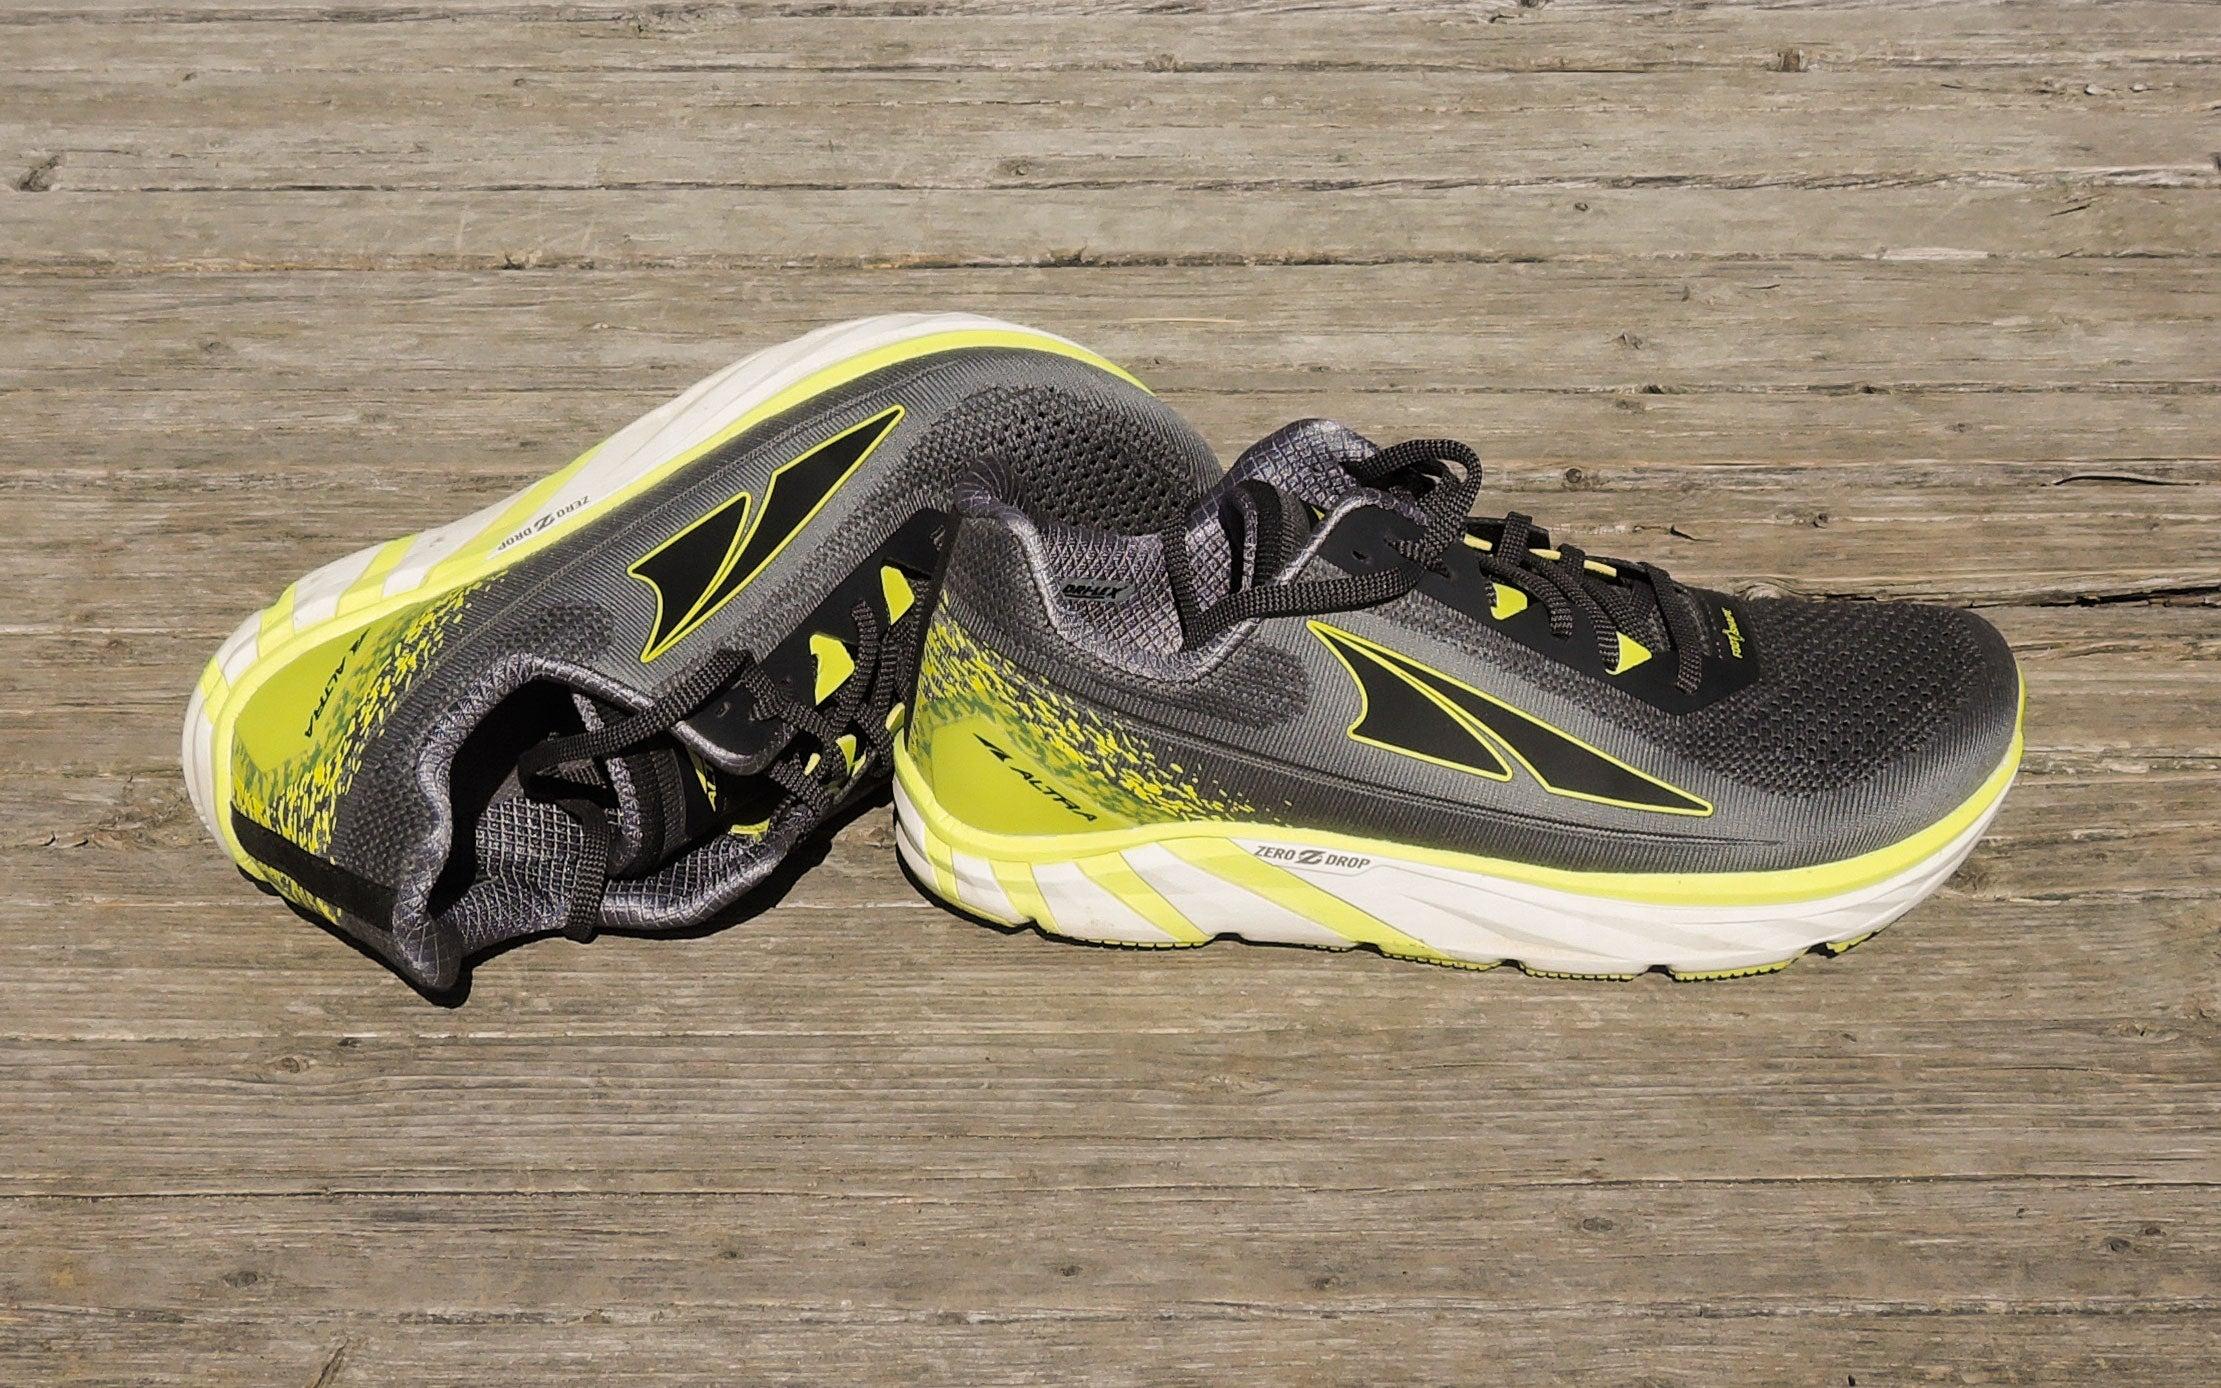 Altra Torin 4 Plush Trail Running shoe with cushioning